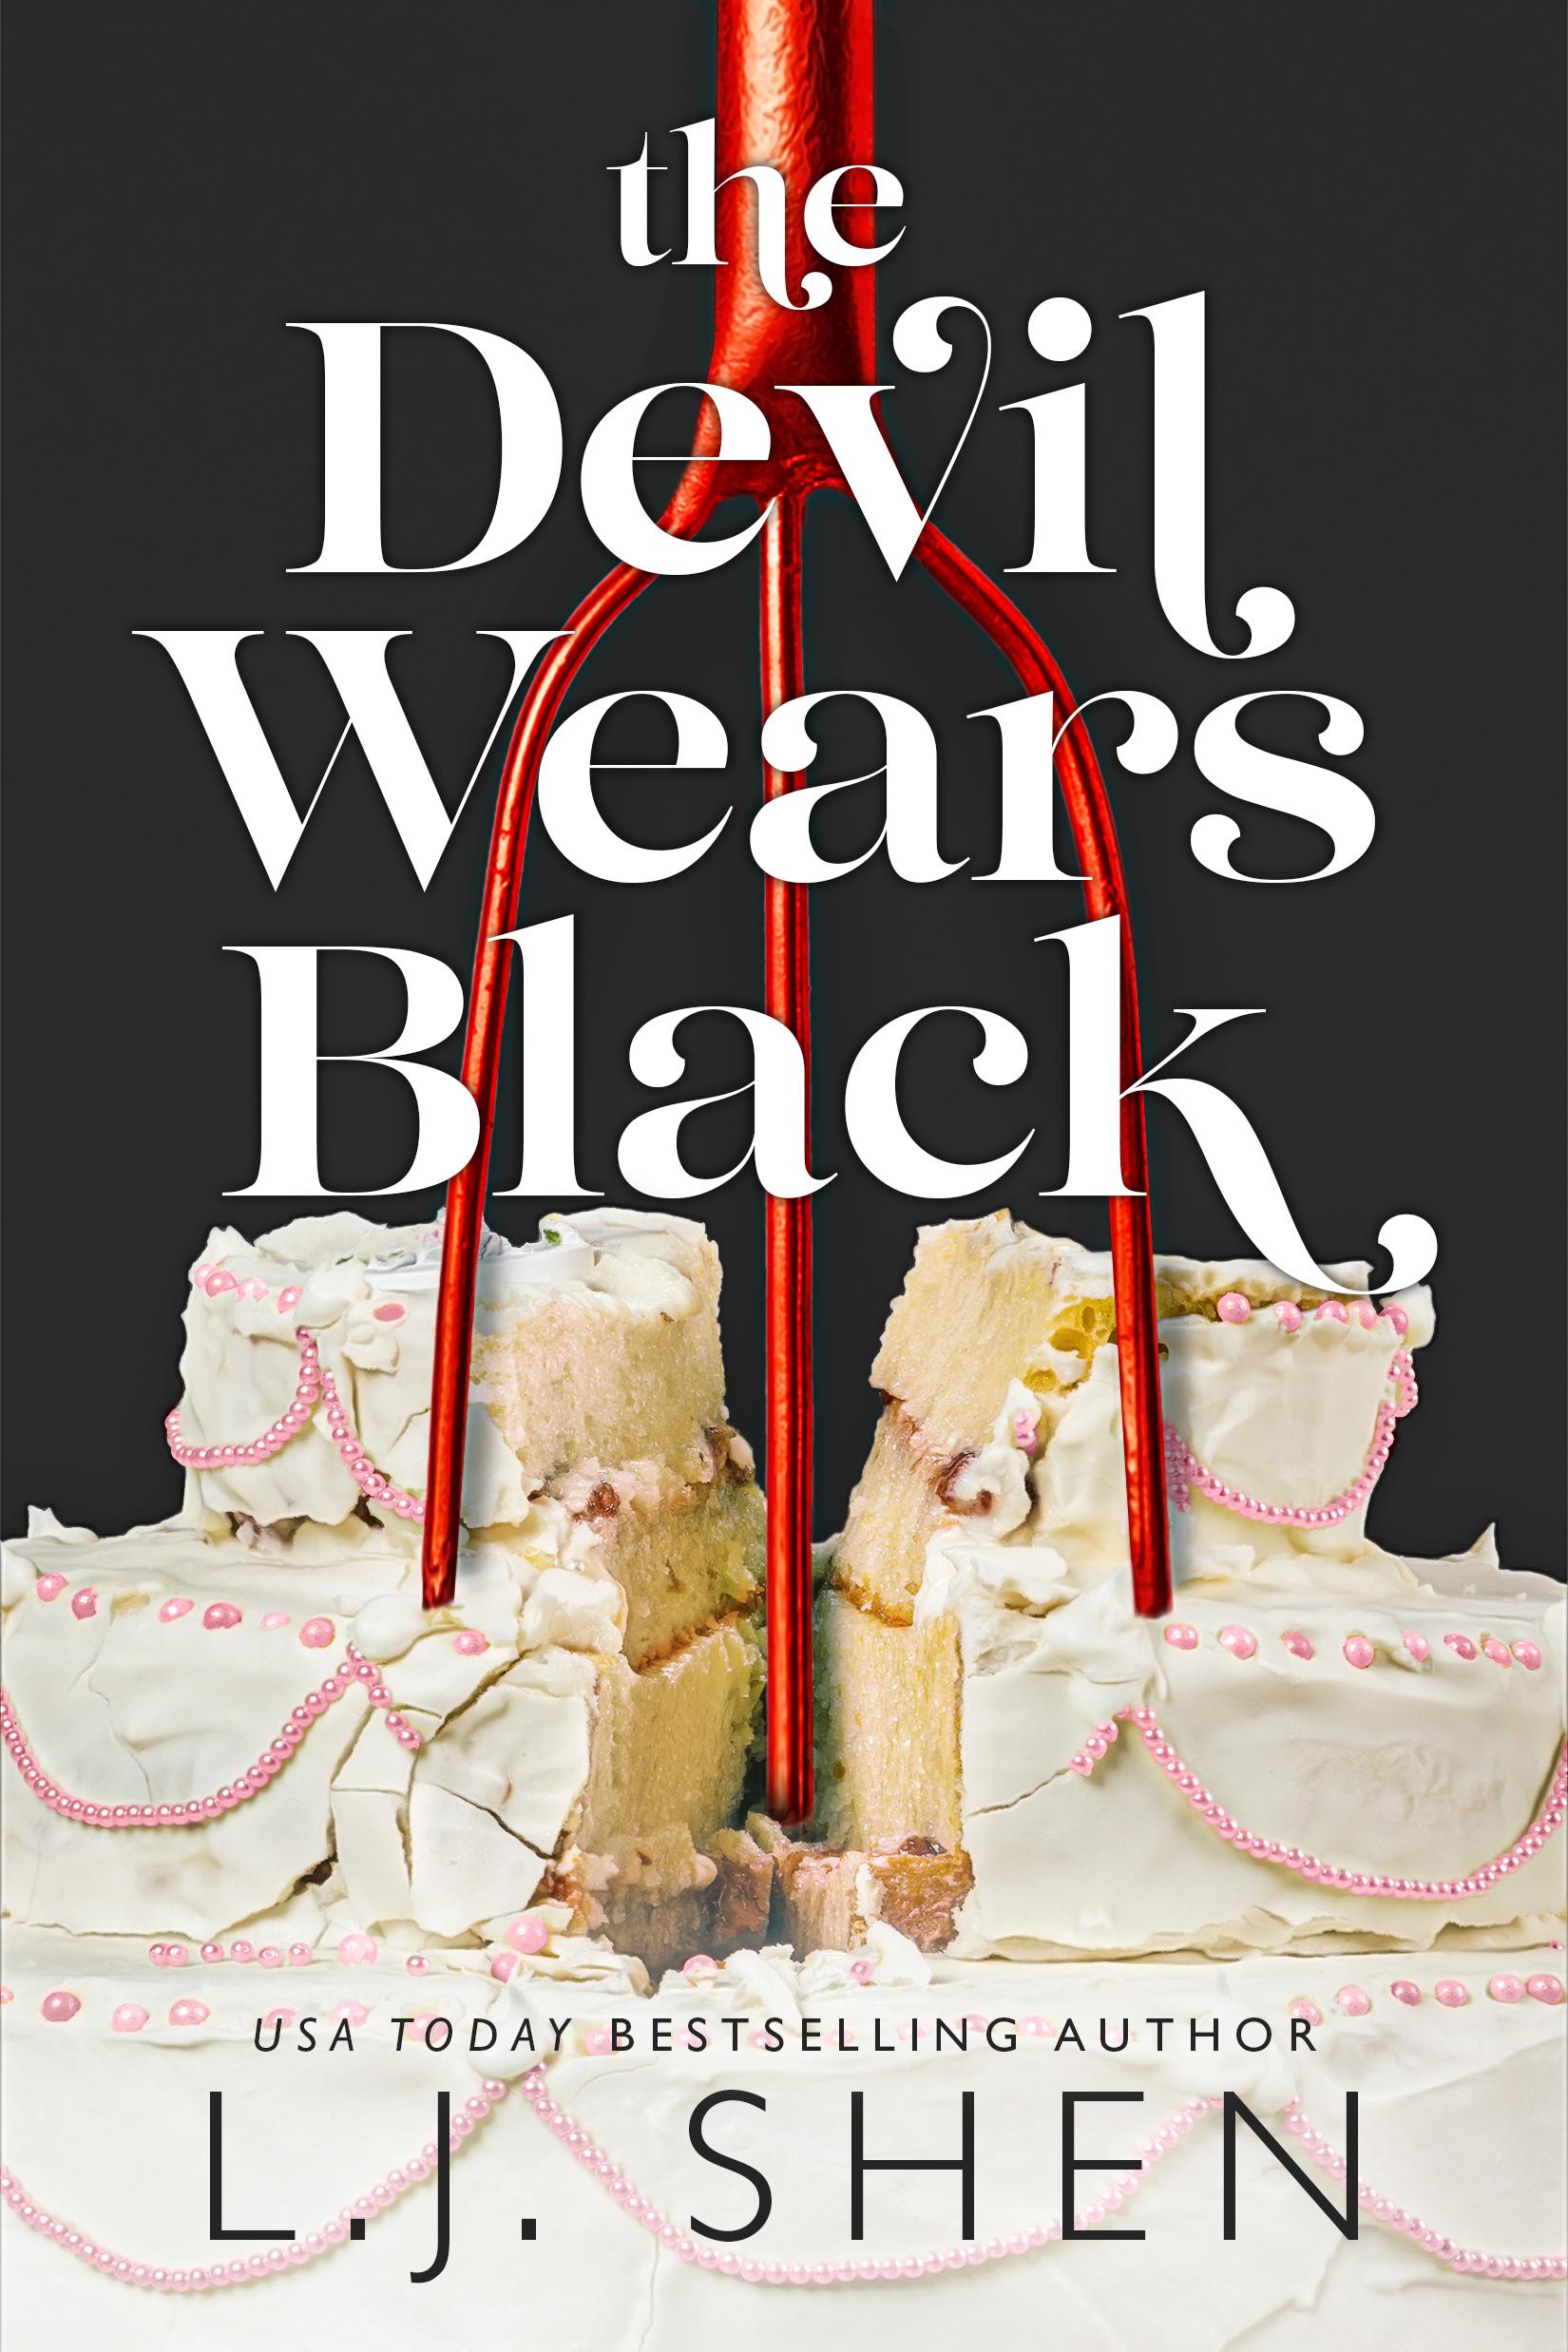 Shen-The Devil Wears Black-29636-FT-V7